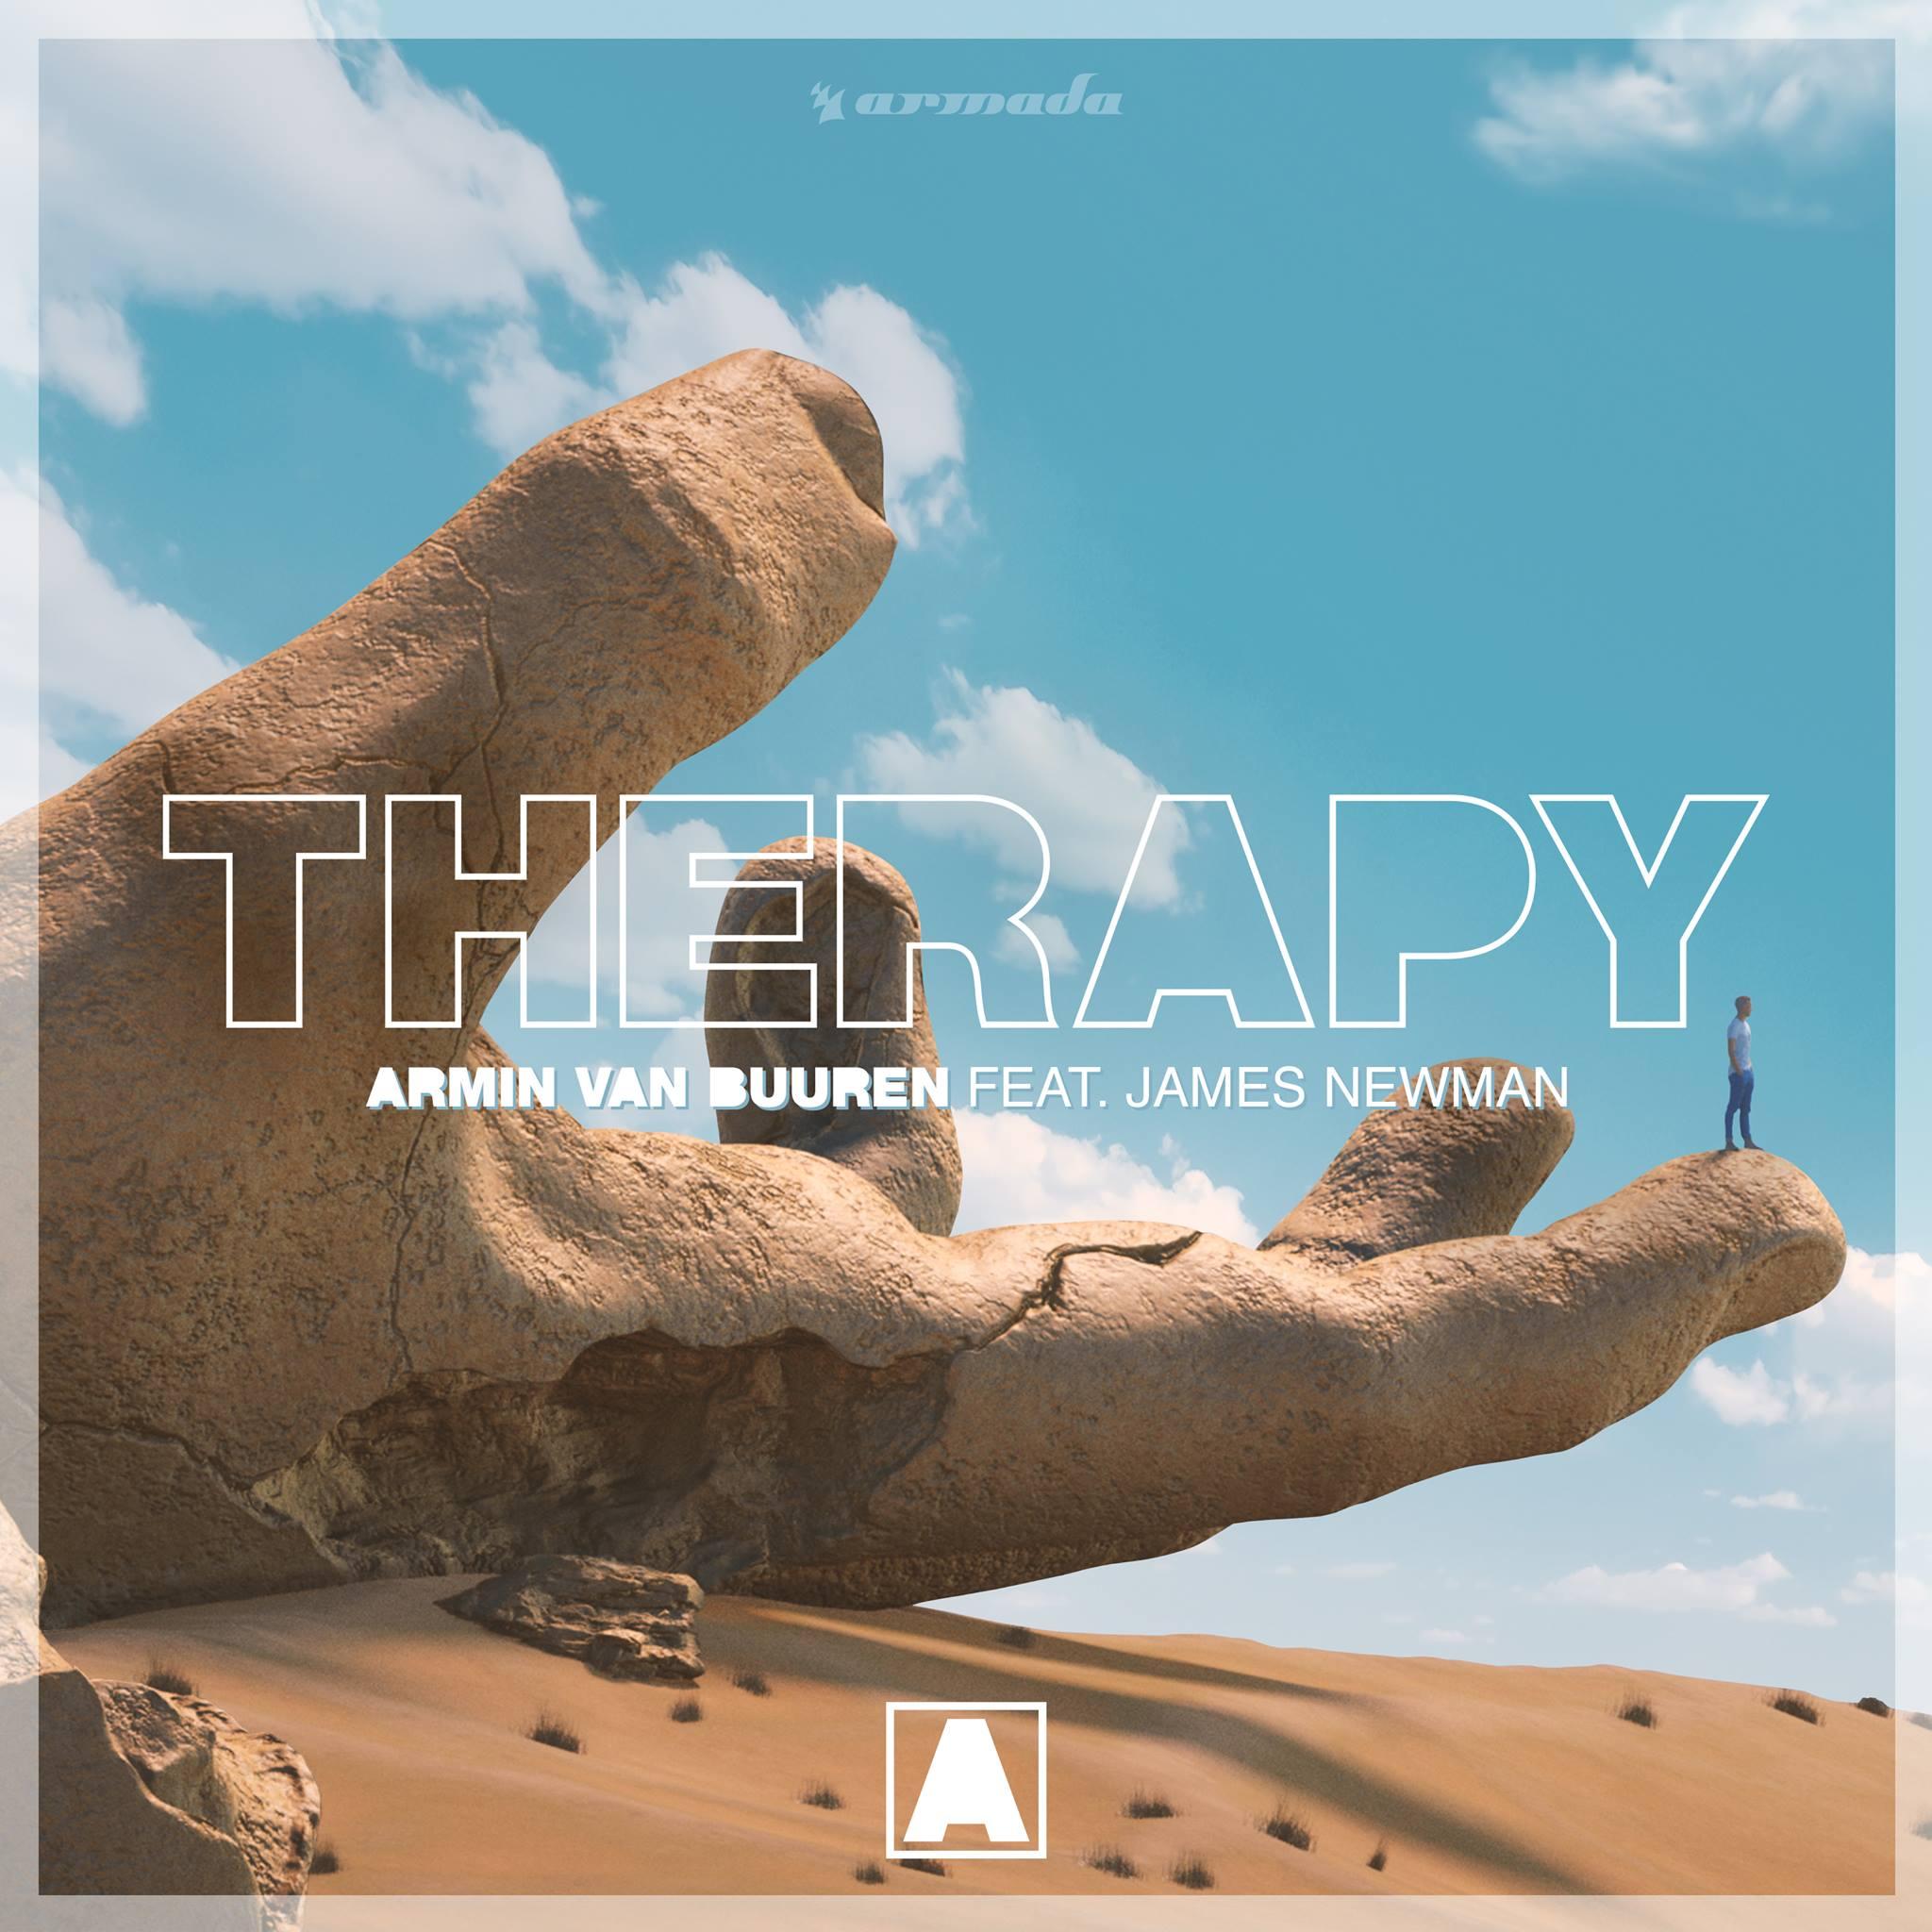 Armin-van-Buuren-feat.-James-Newman-Therapy